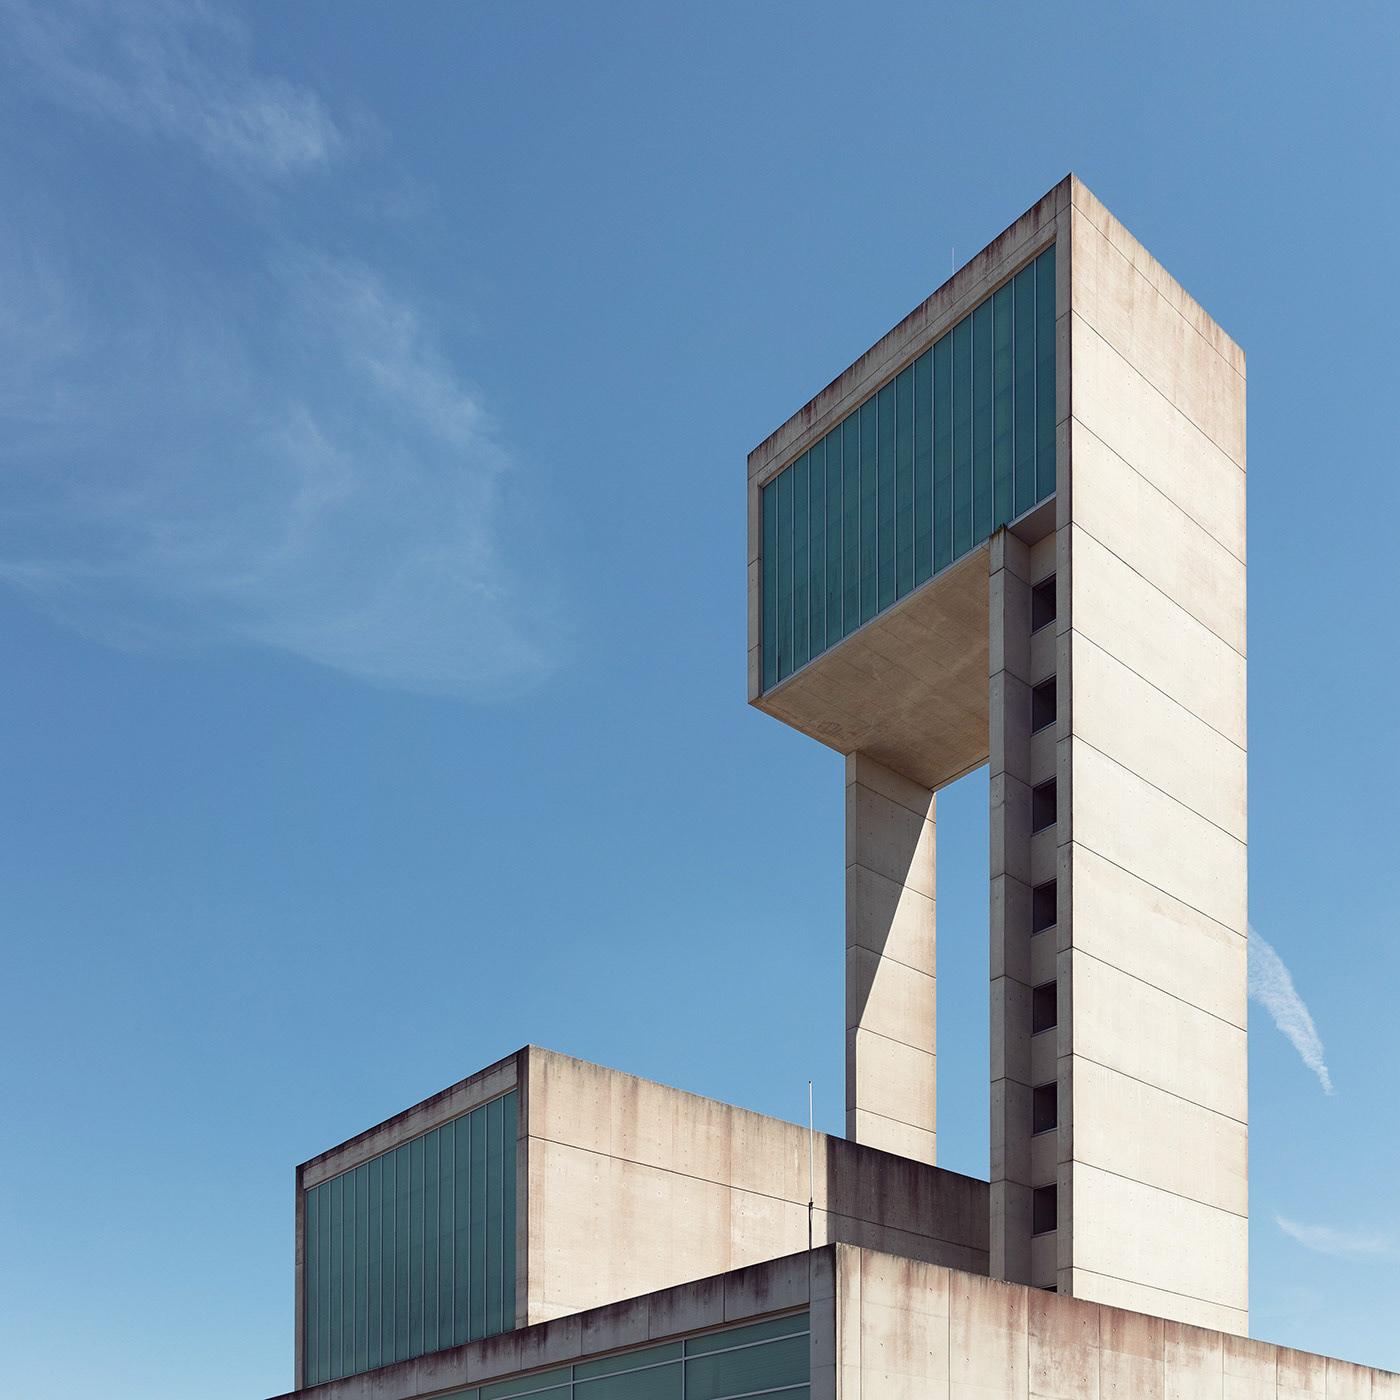 modern architecture,luxembourg,contemporary,design,concrete,city,buildings,arquitectura,Urban,contemporary architecture